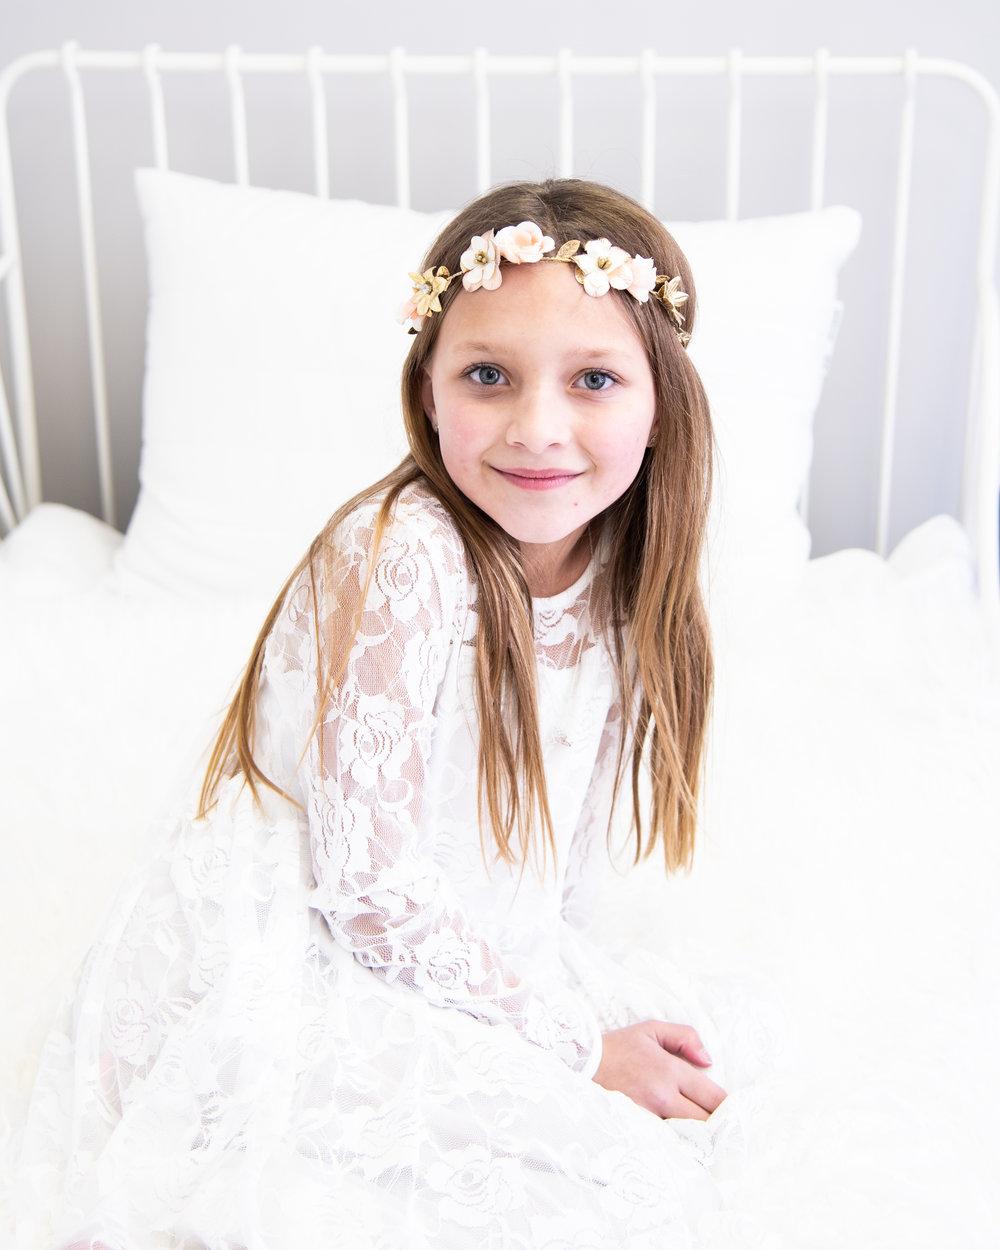 Kyla Jo Photography // Muncie, Indiana Photographer // Indiana Photographer // Midwest Photographer // studio photographer // kids in studio // portraits of kids // portrait photographer // 8 year old photos // girl in white lacy dress